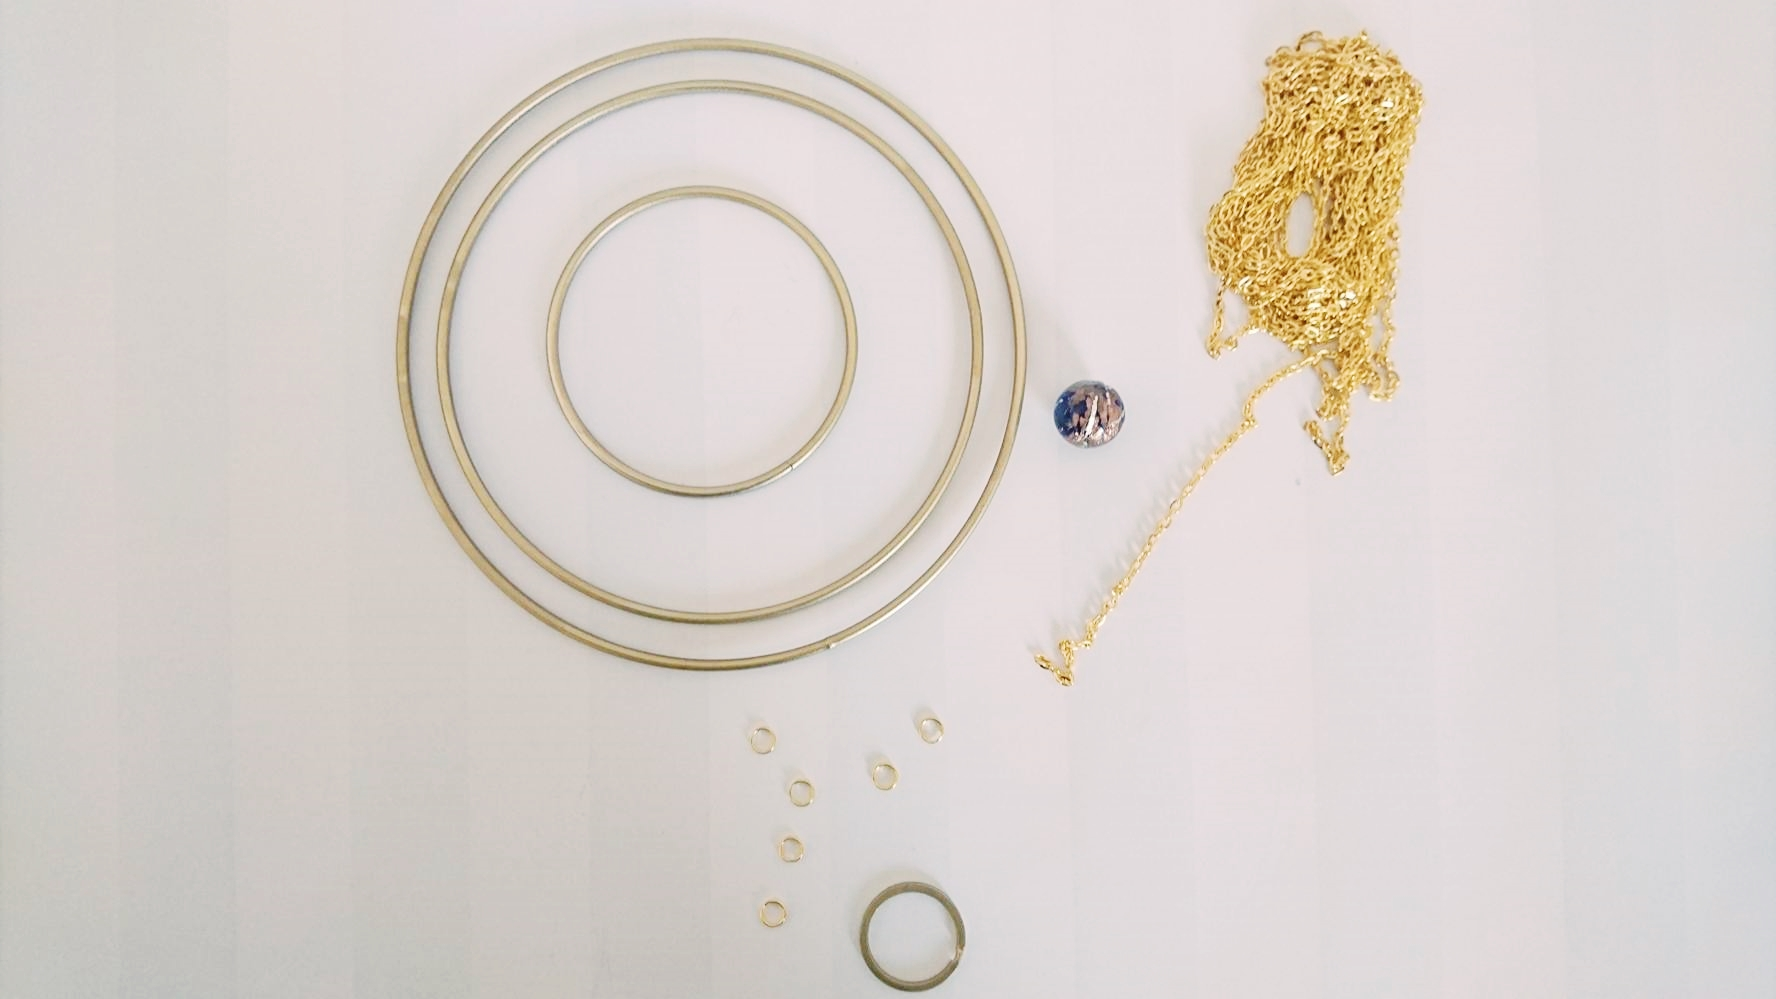 Material DIY Mobile, Metallringe, Goldkette basteln, Murmel, Schlüsselanhänger